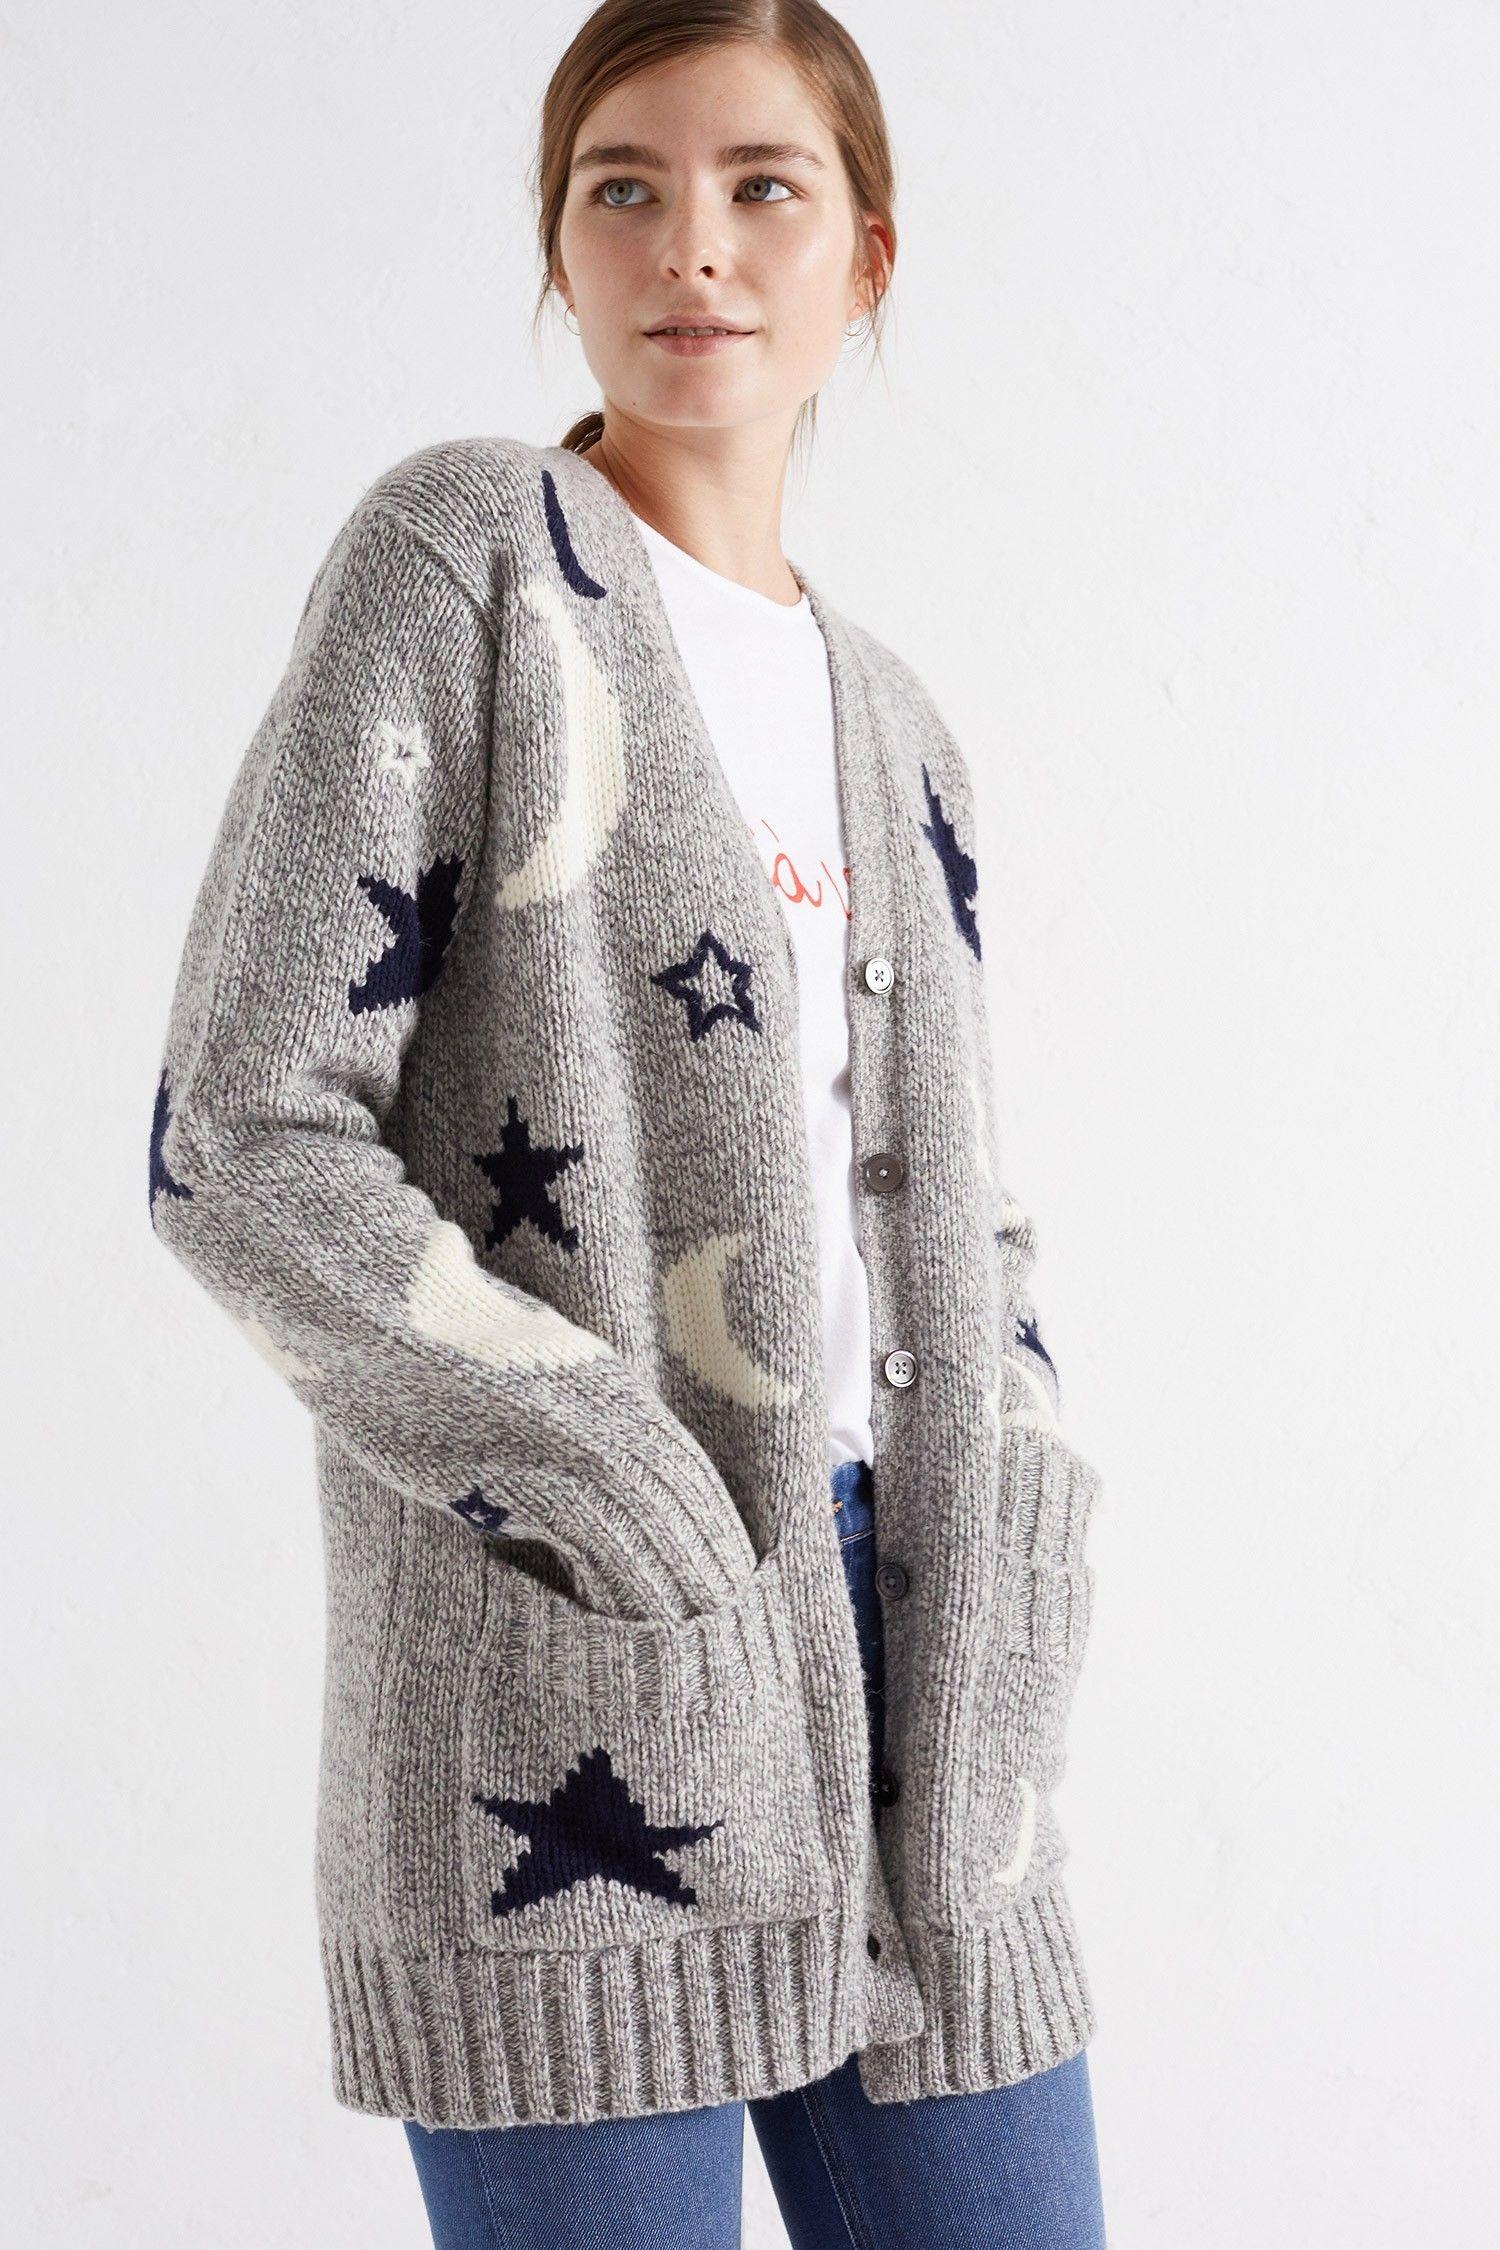 EXCLUSIVE Grey Midnight Sky Boyfriend Cardigan | Crochet & Knit ...